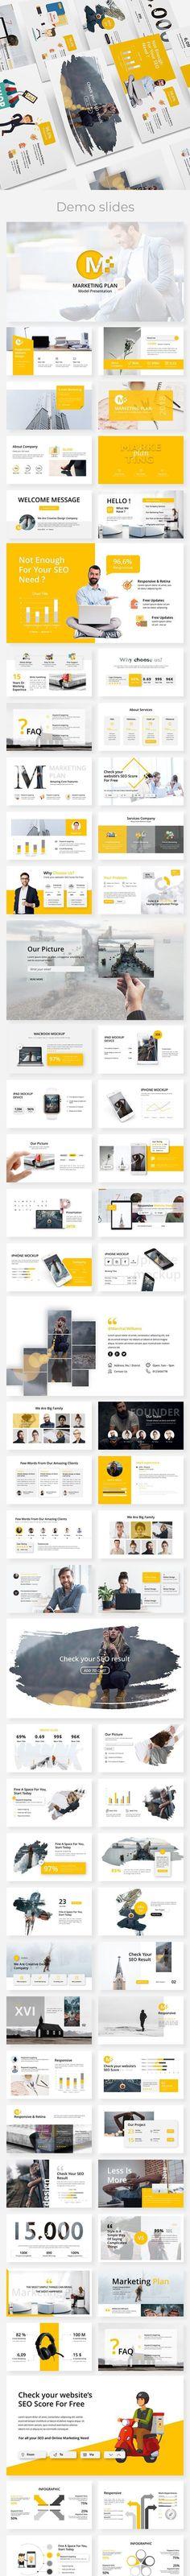 Business Presentation Templates, Presentation Design, Slide Template, Broken Images, Creative Visualization, Company Profile, Marketing Plan, Keynote Template, Flyer Design